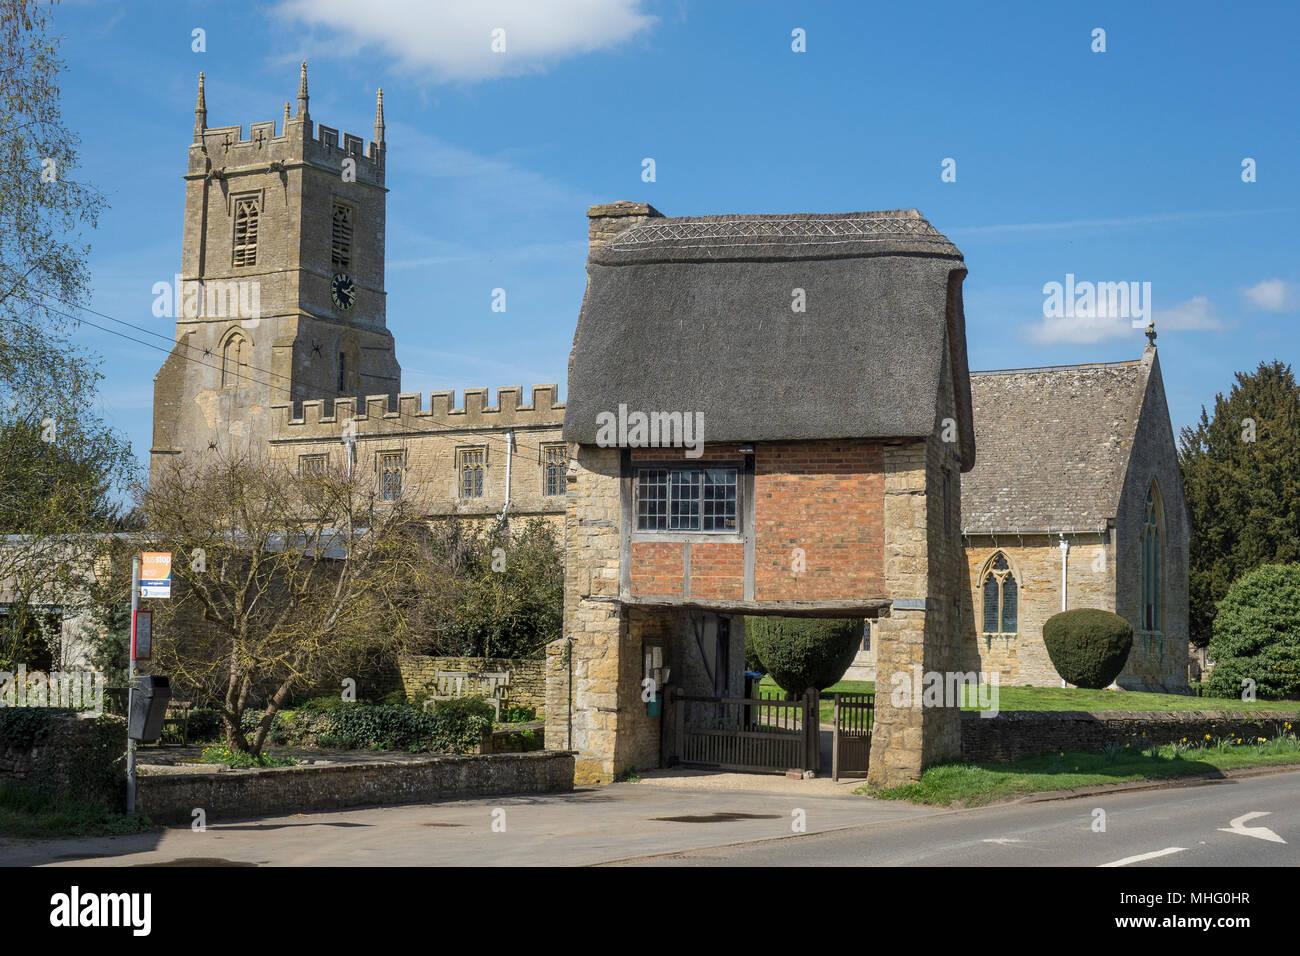 England, Warwickshire, Long Compton church & Lych gate - Stock Image